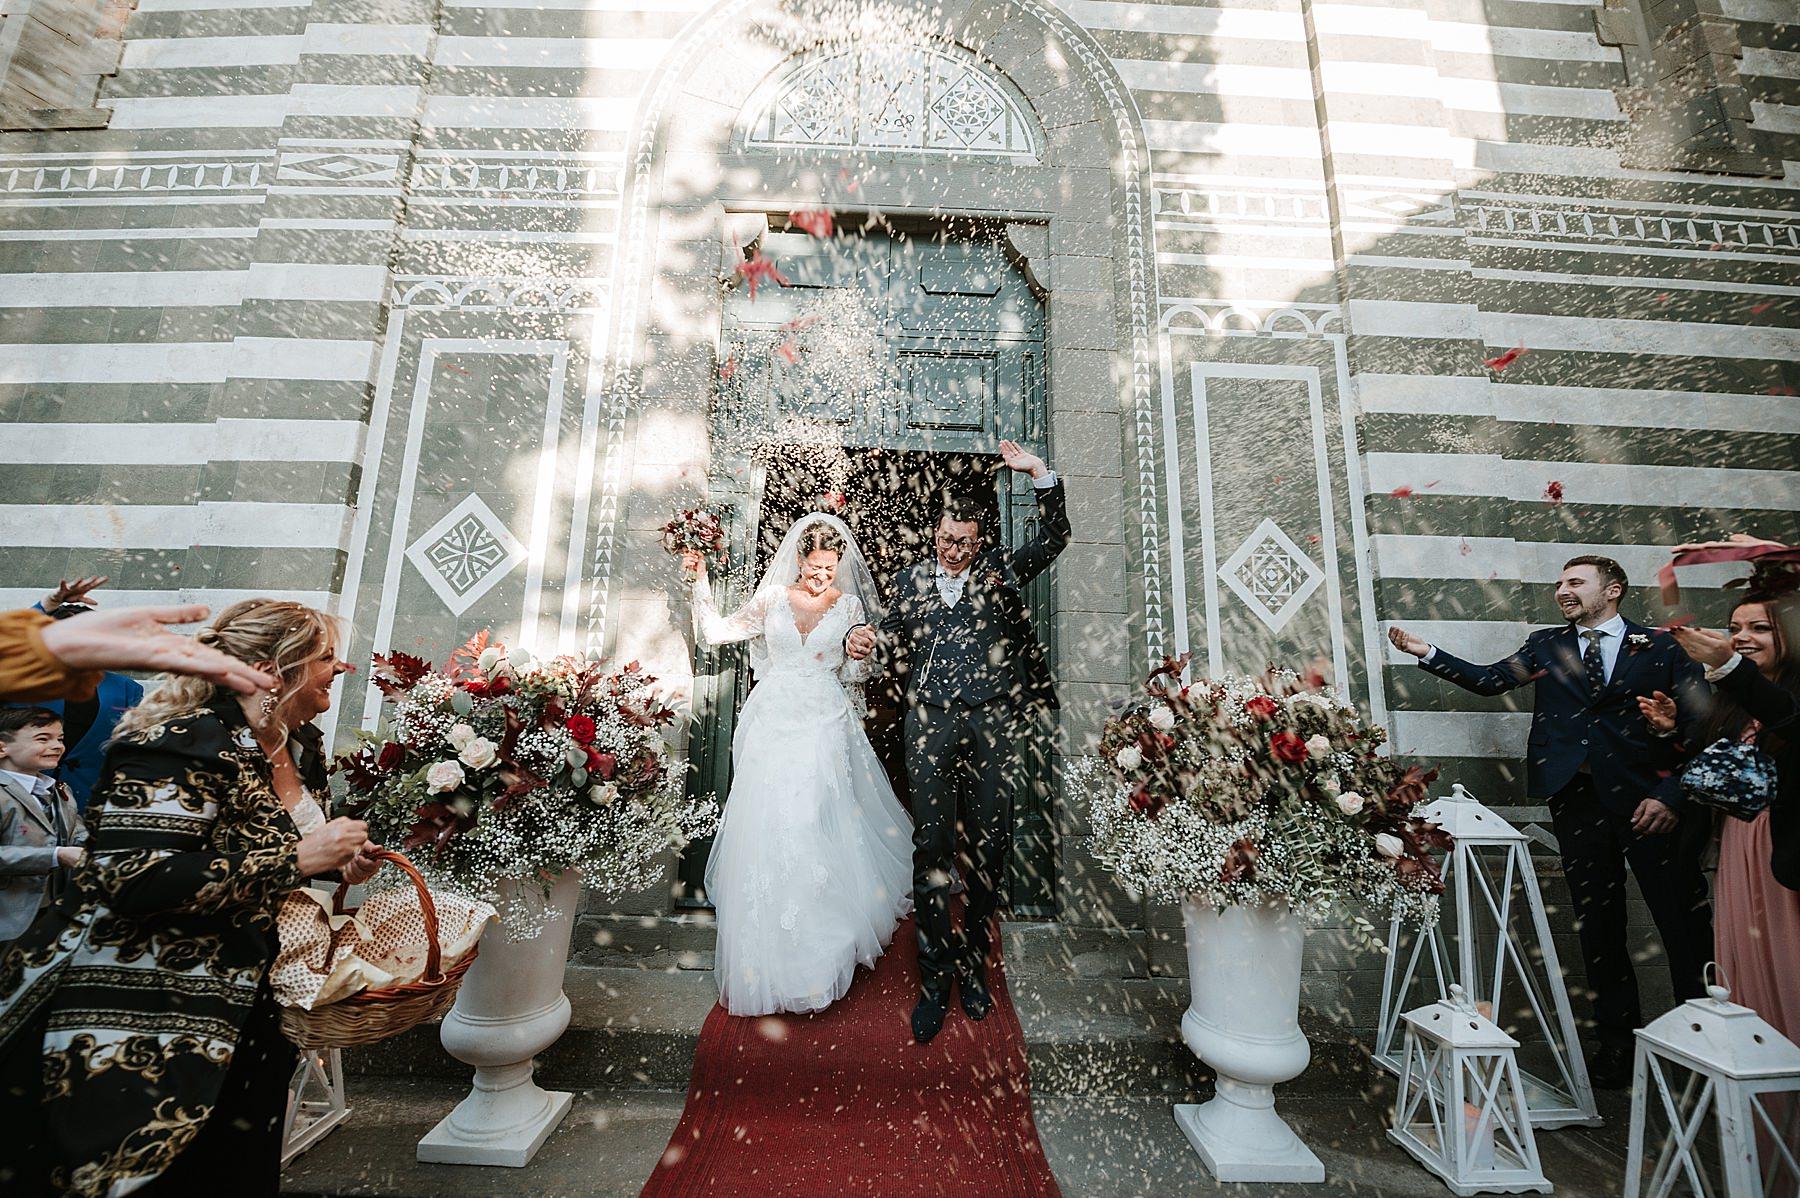 Matrimonio romantico nel chianti